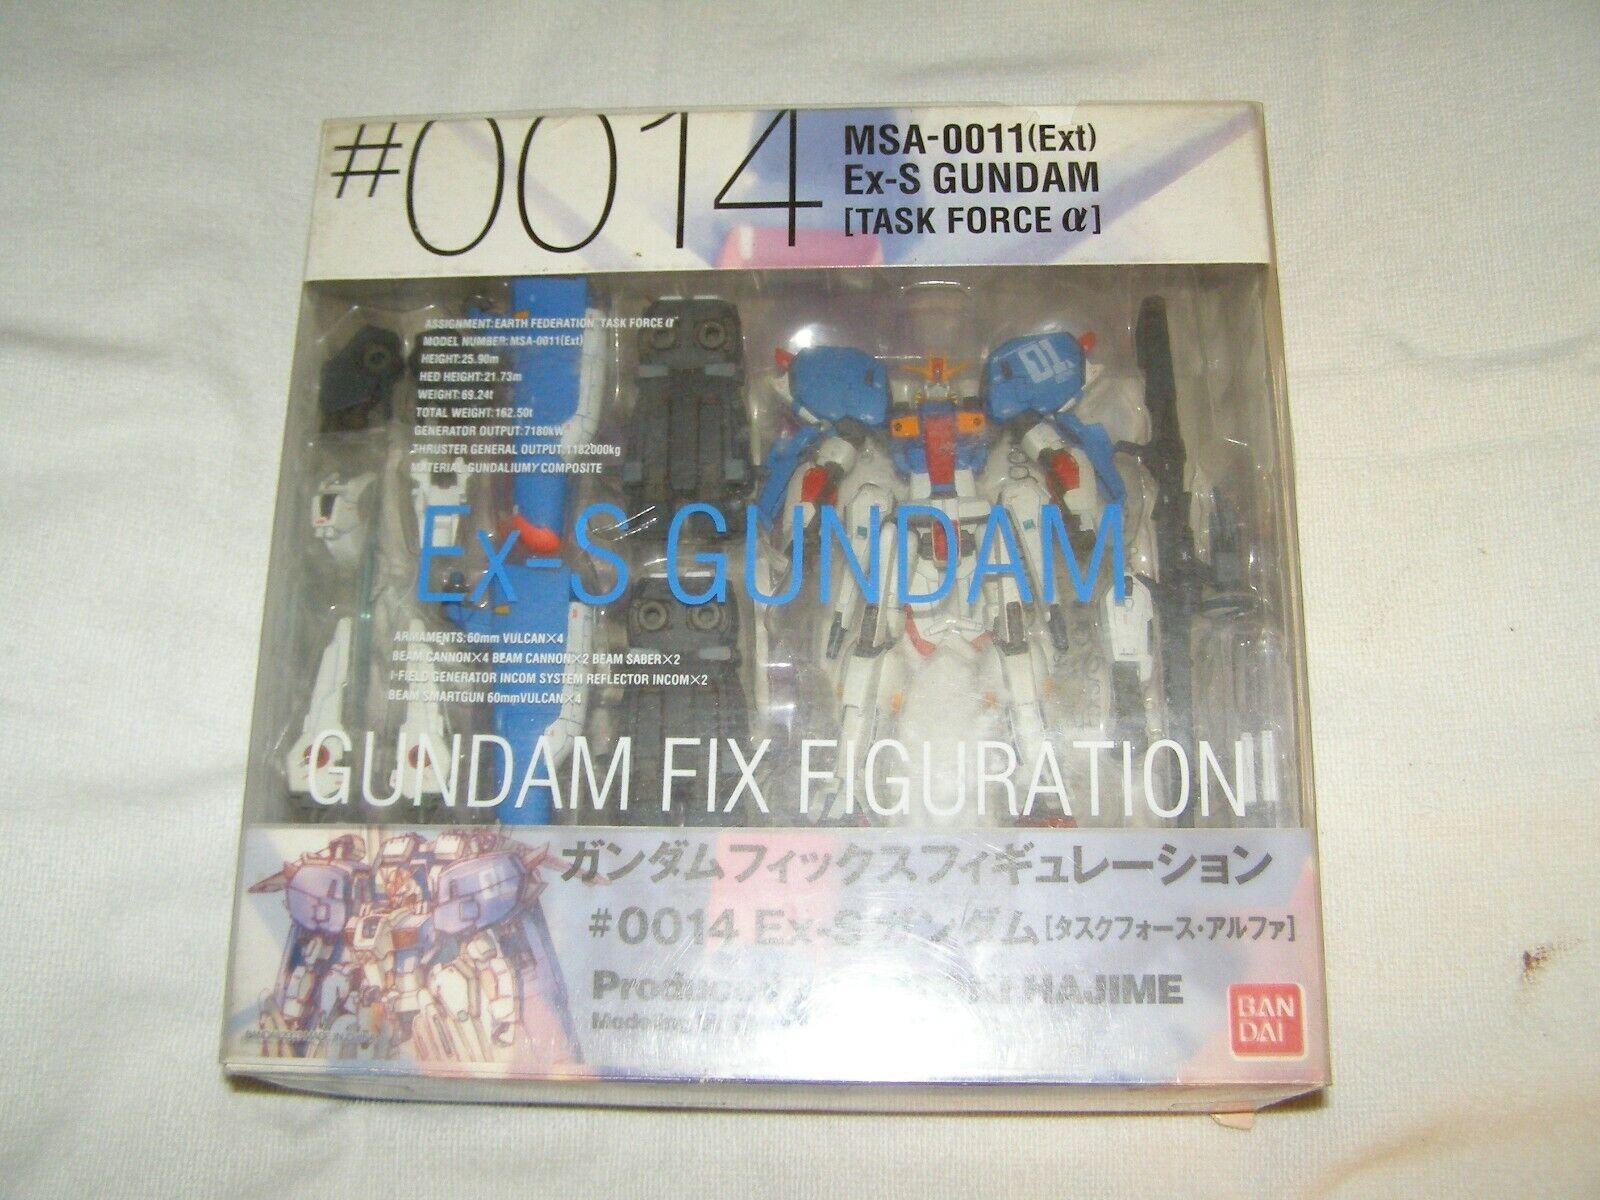 0014 Gundam FIX Figuration MSA-0011 EX-S Gundam action figure